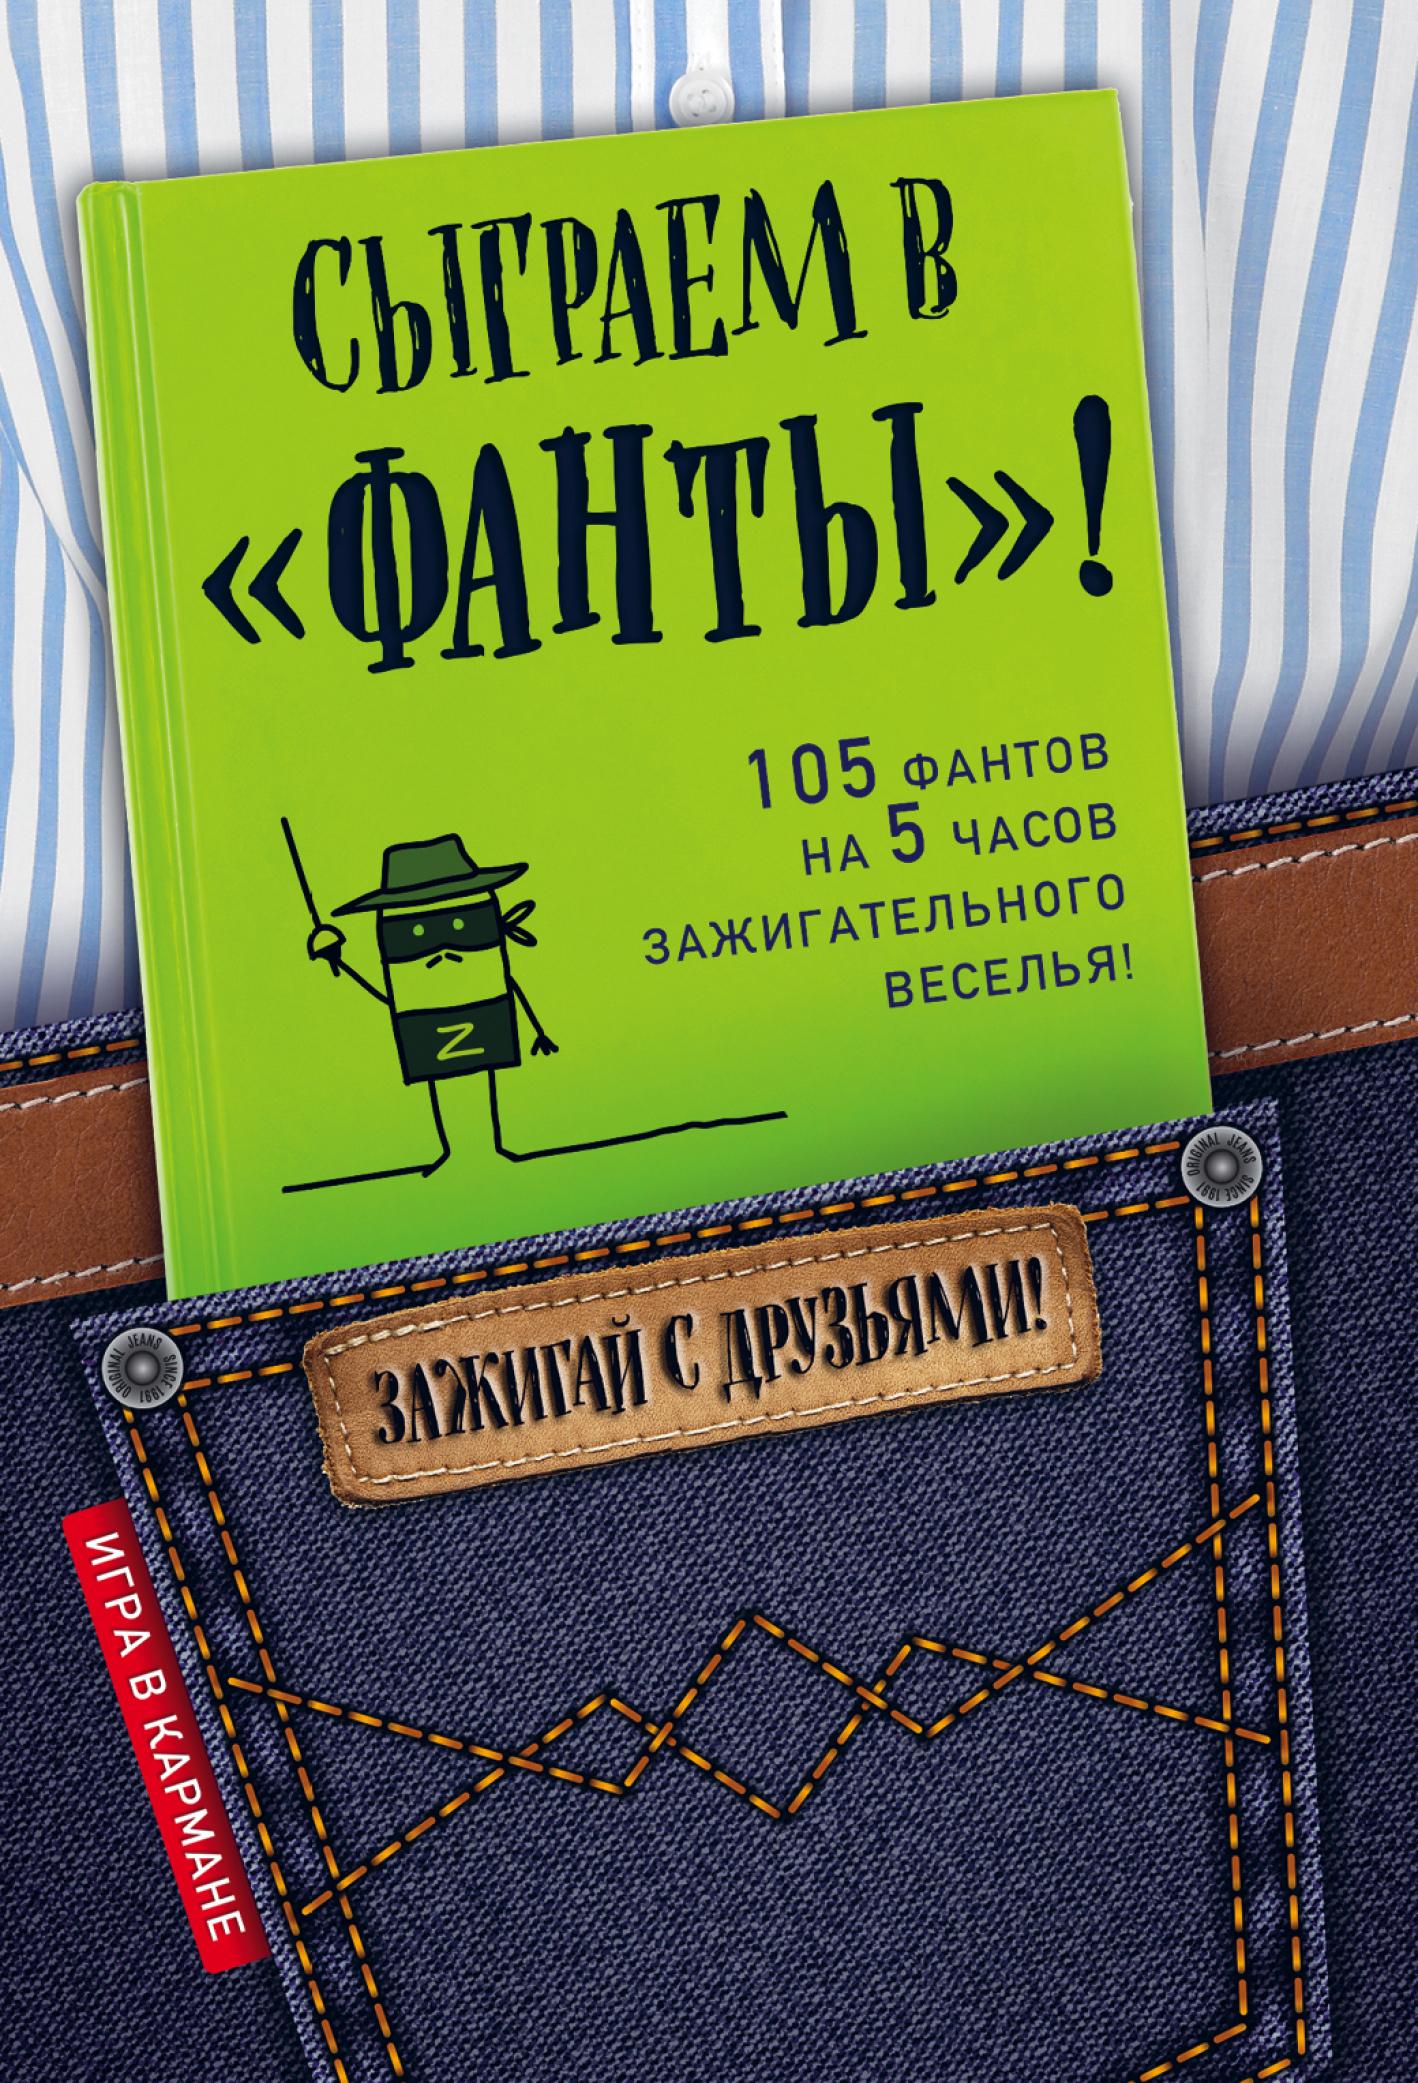 Ирина Парфенова Сыграем в «Фанты»! игра на клавишах души